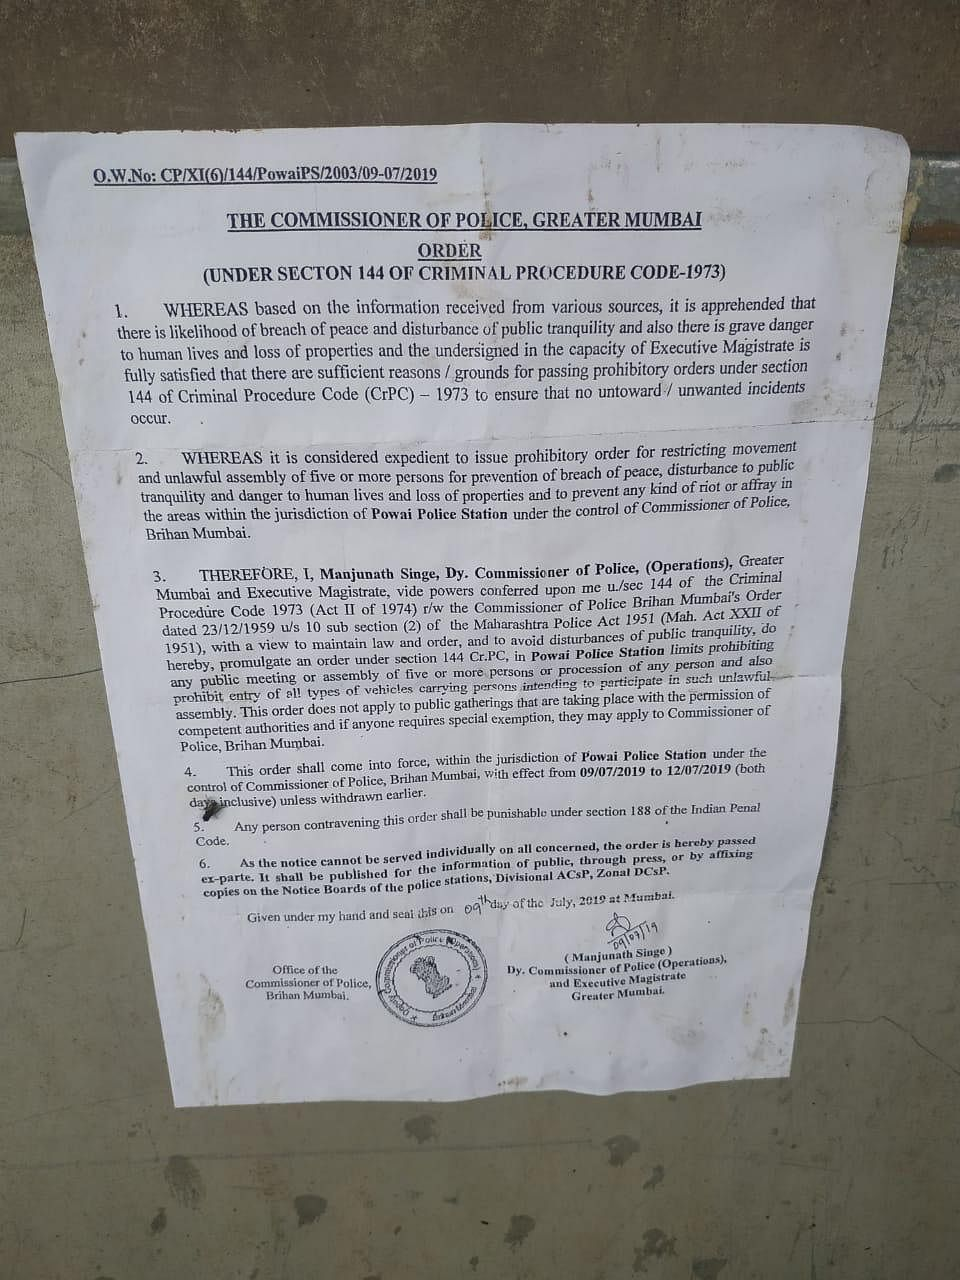 K'taka Crisis: Siddaramaiah Meets Rebel MLA Ramalinga Reddy